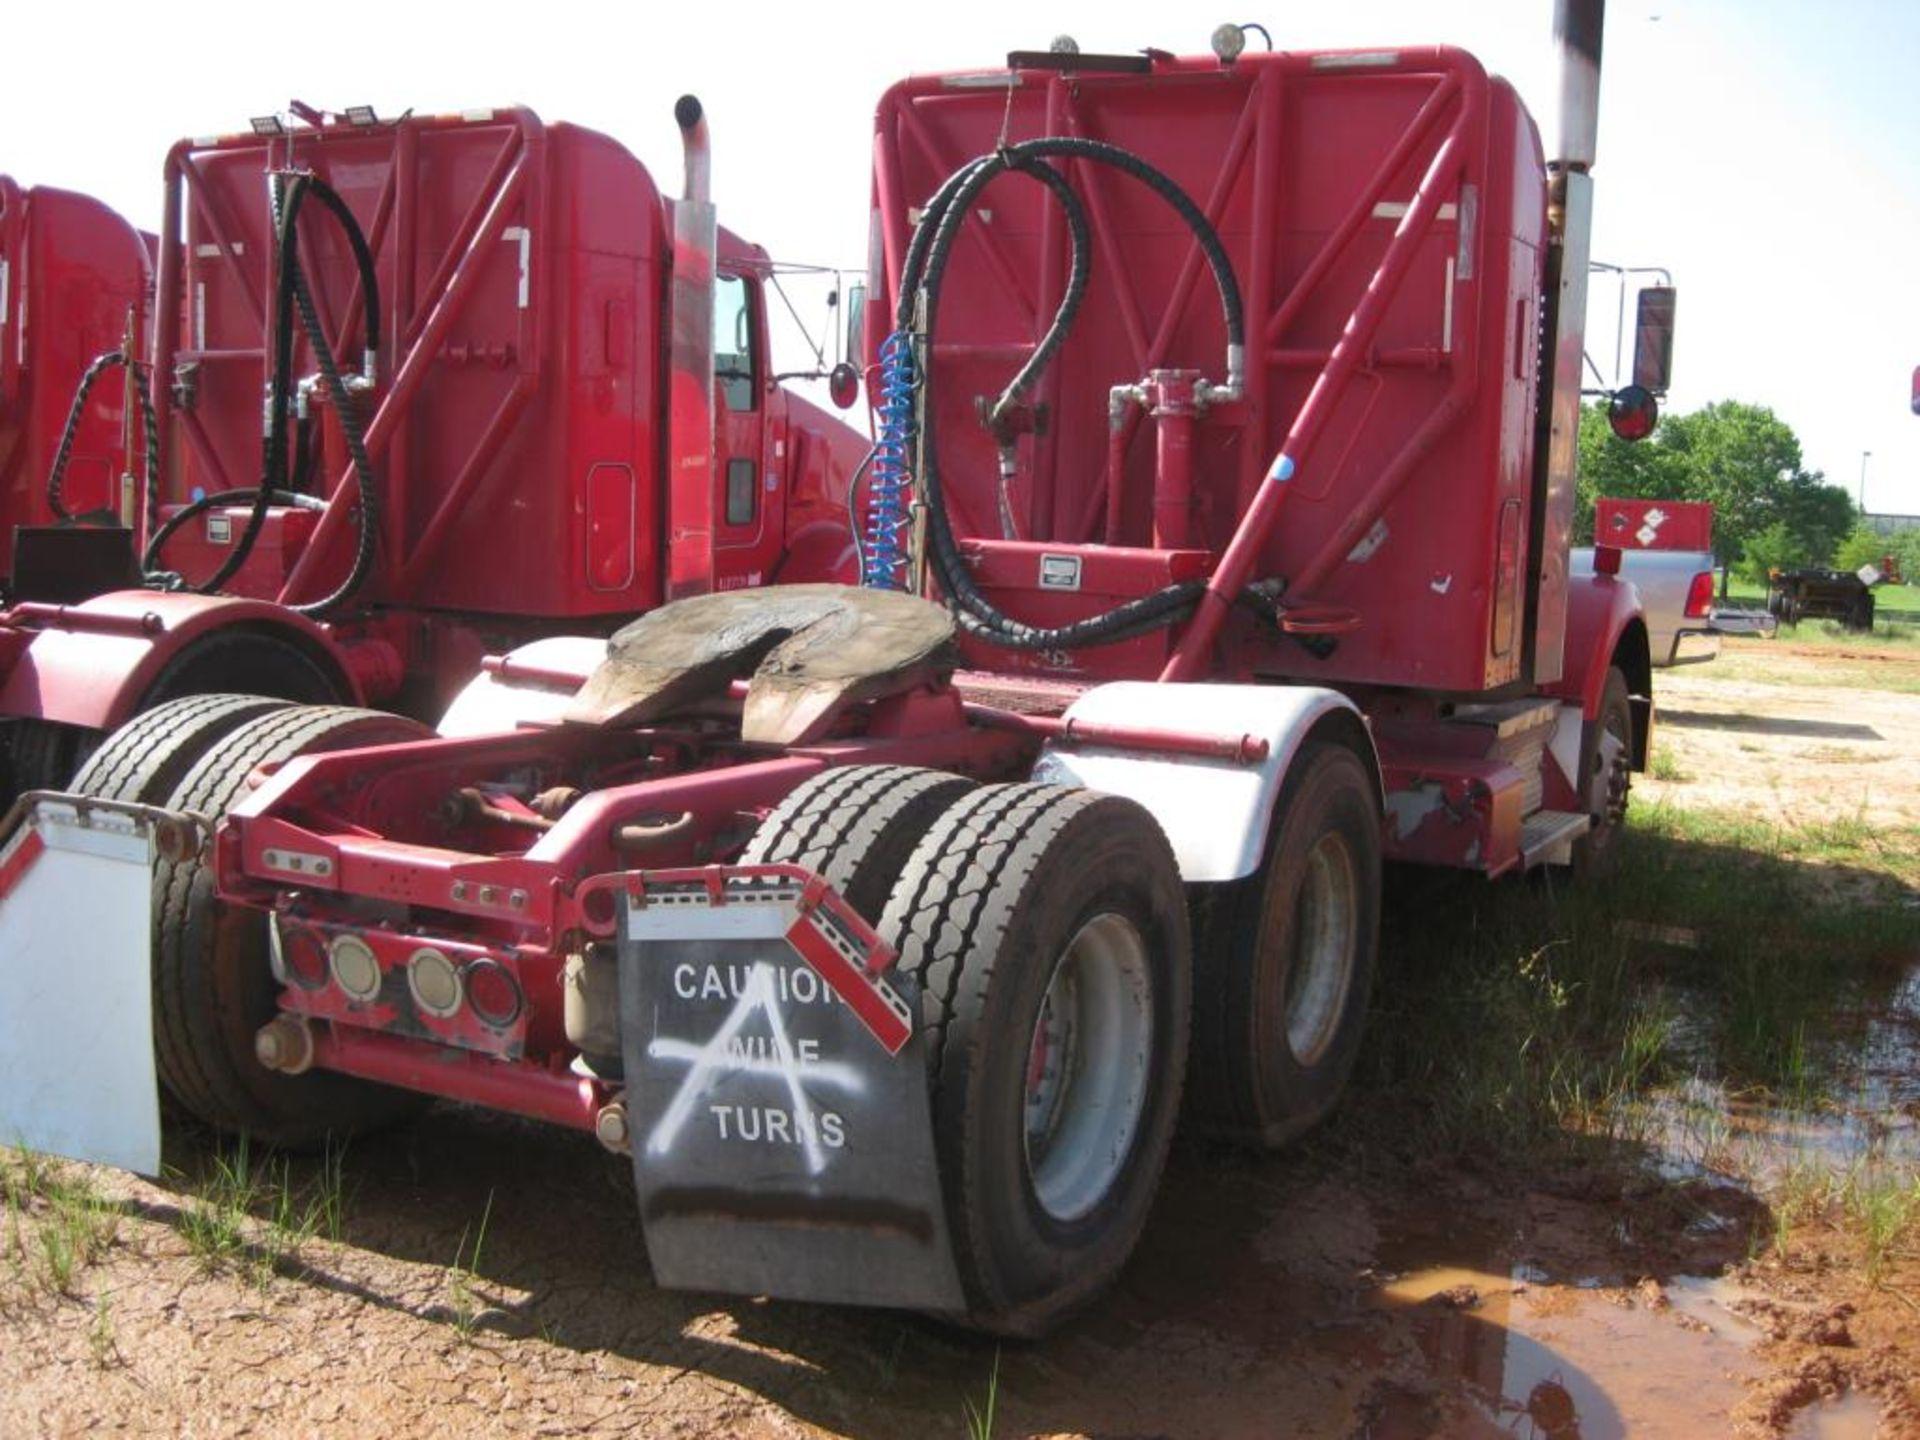 Kenworth Truck - Image 4 of 21